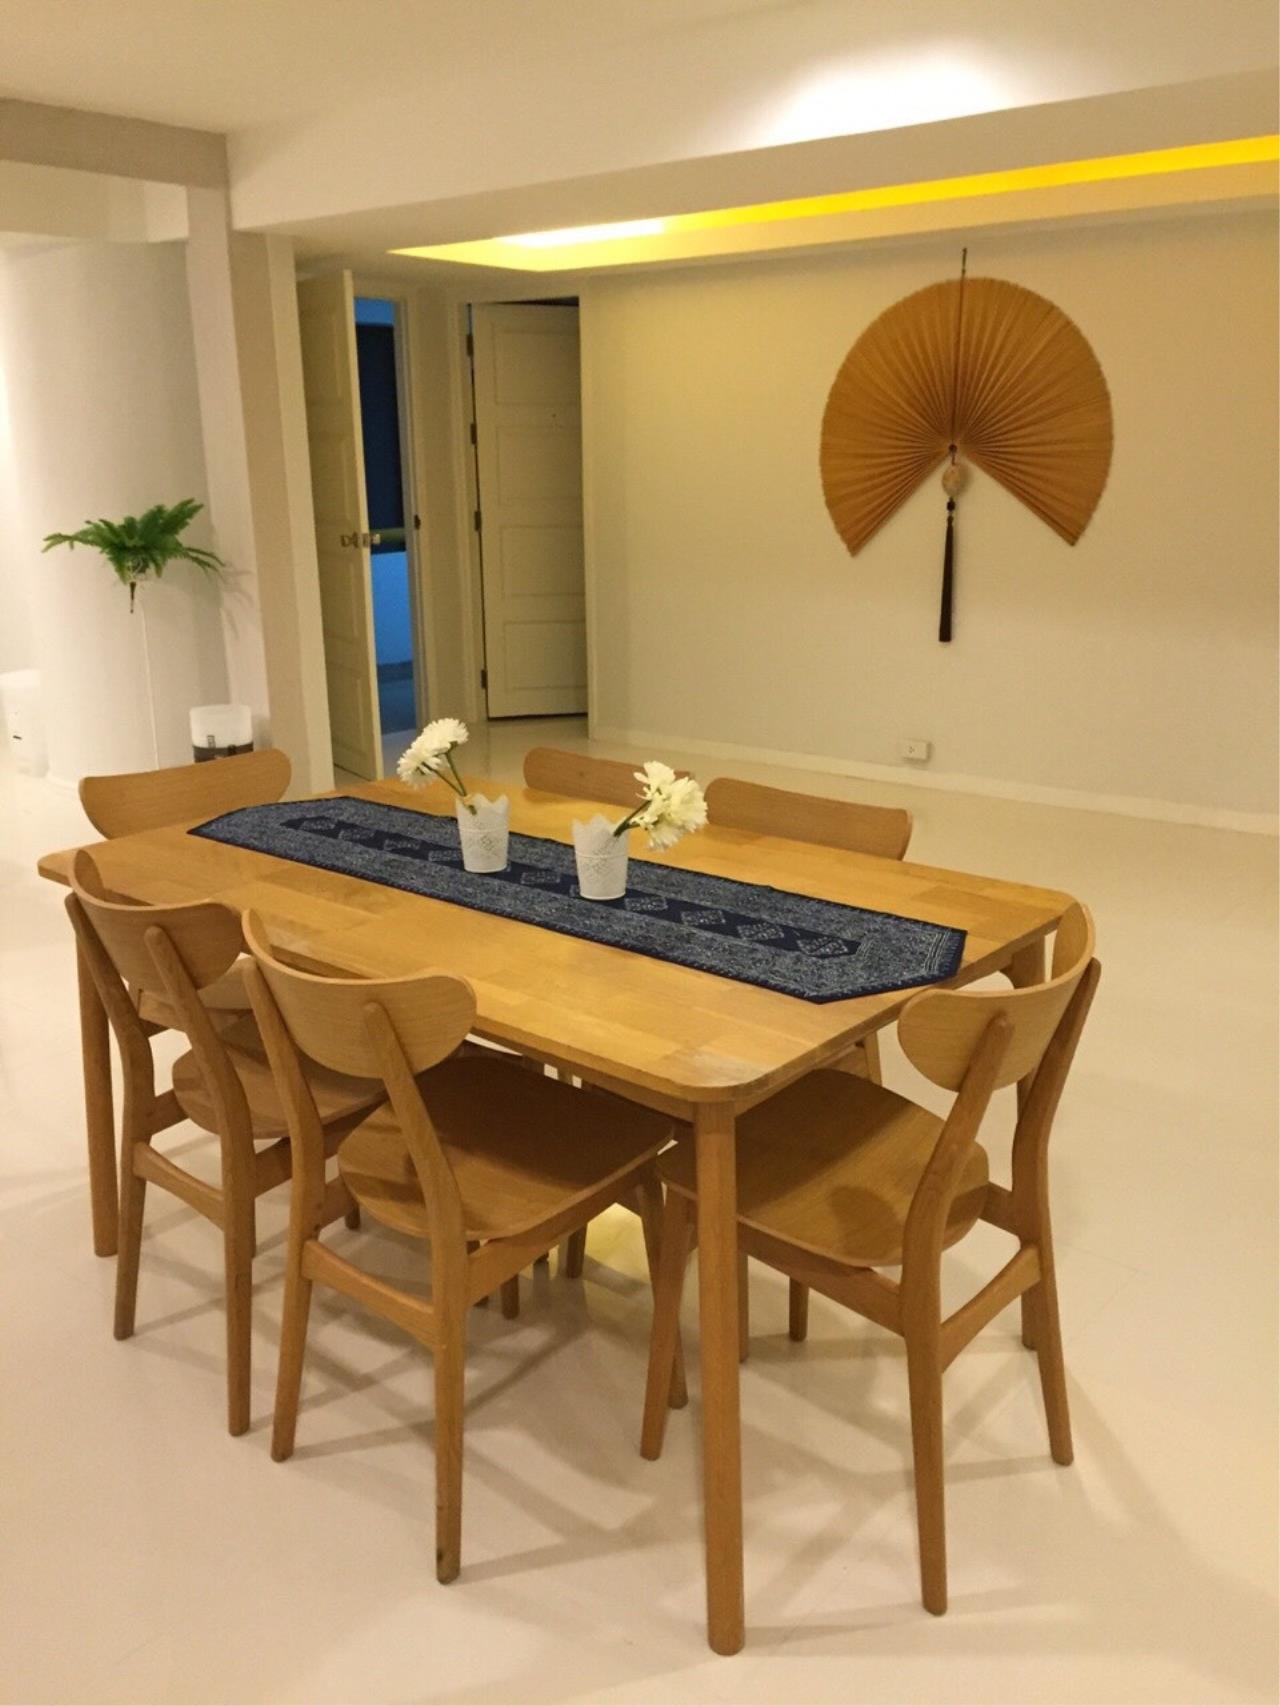 Blueocean property Agency's Condo For Rent – Sunshine Beach Condotel Pattaya 13